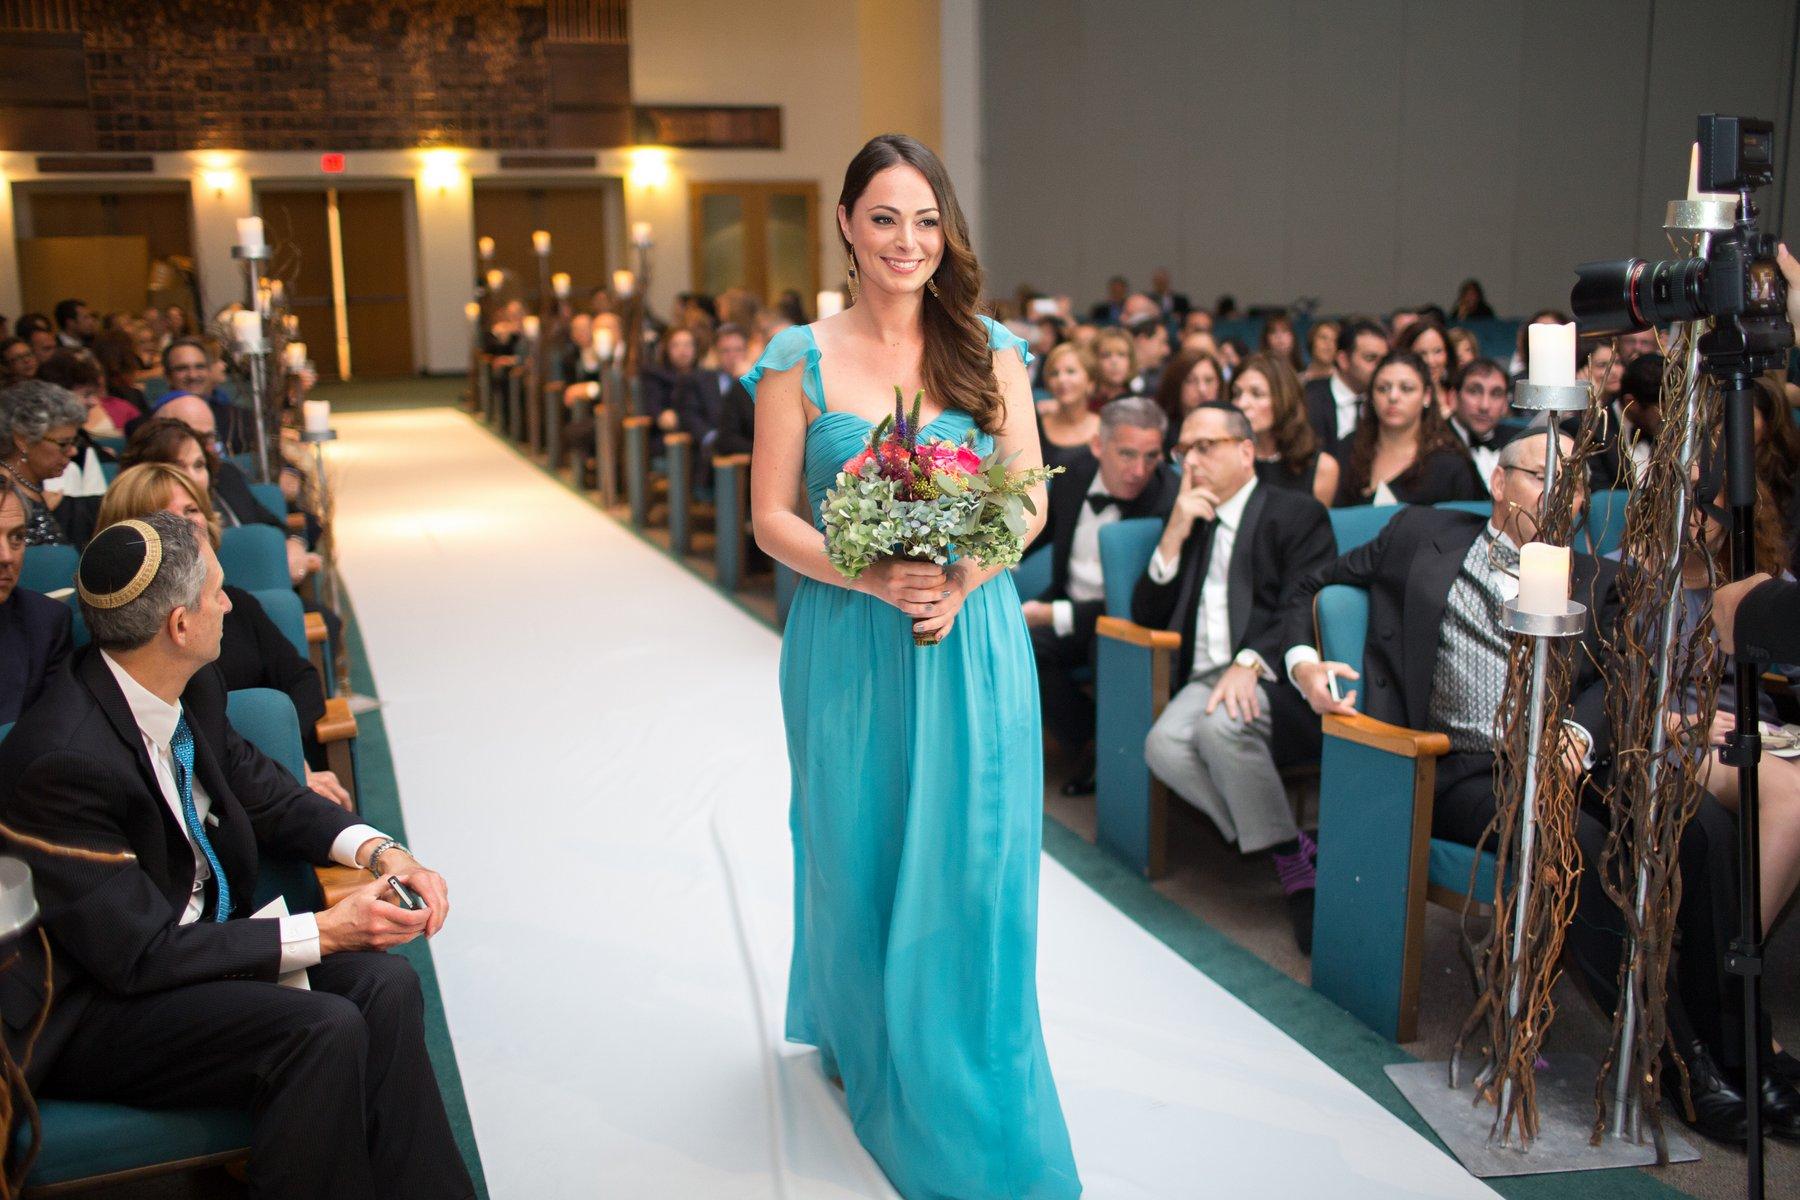 jewish wedding ceremony photos